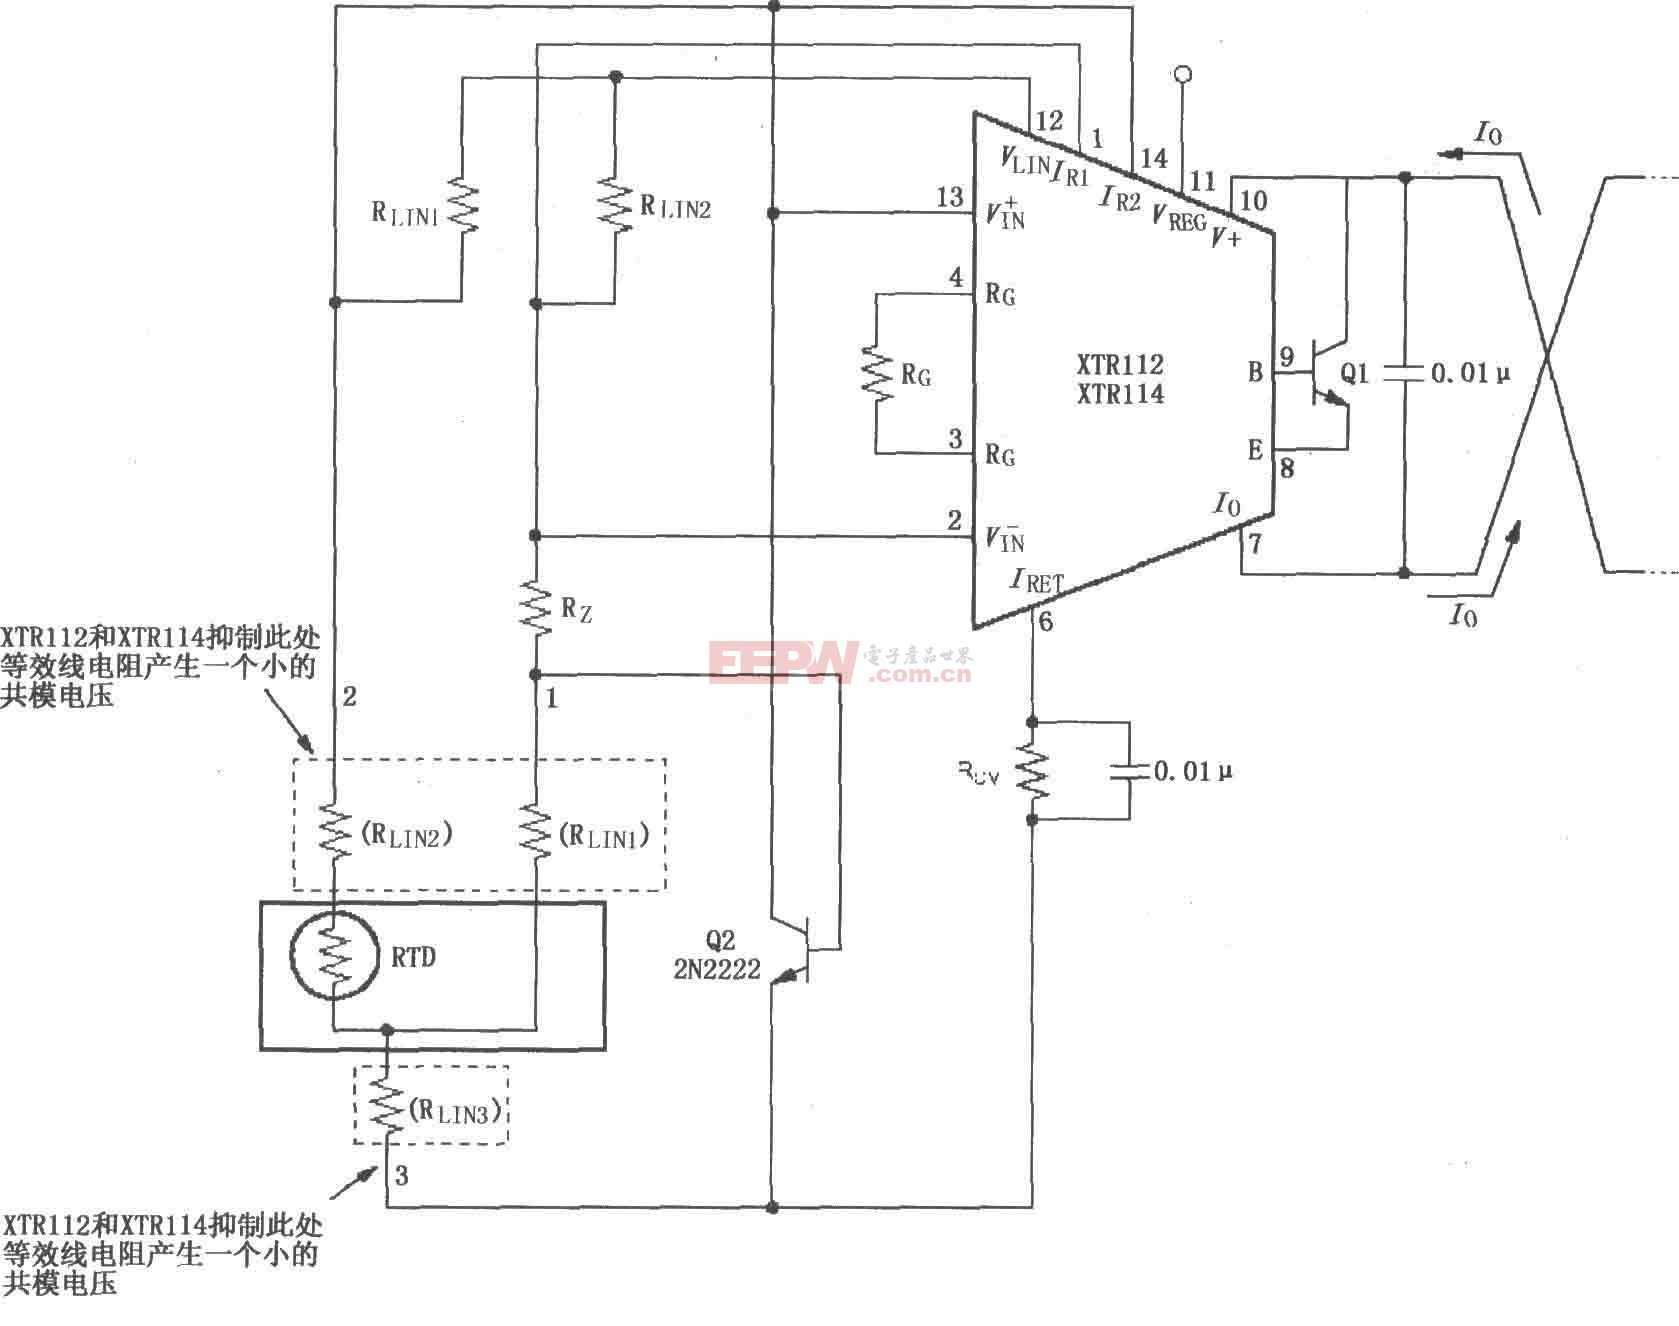 XTR112/114三線遠程電阻式熱探測器連接電路圖